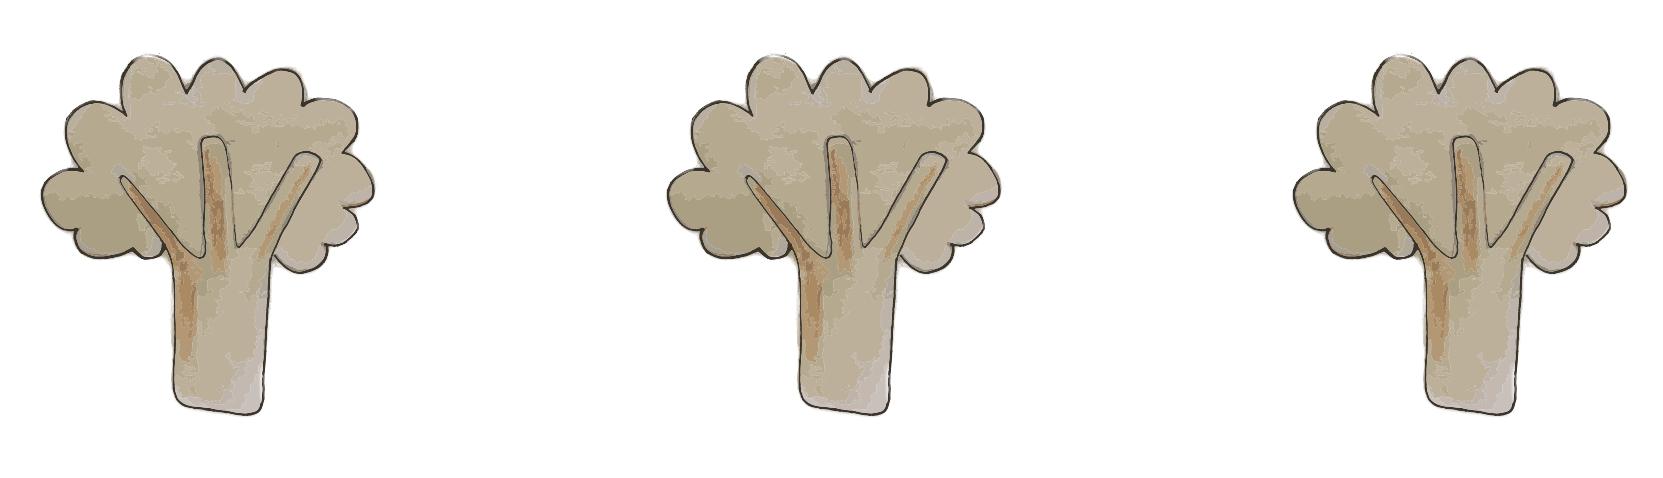 cauliflower .png